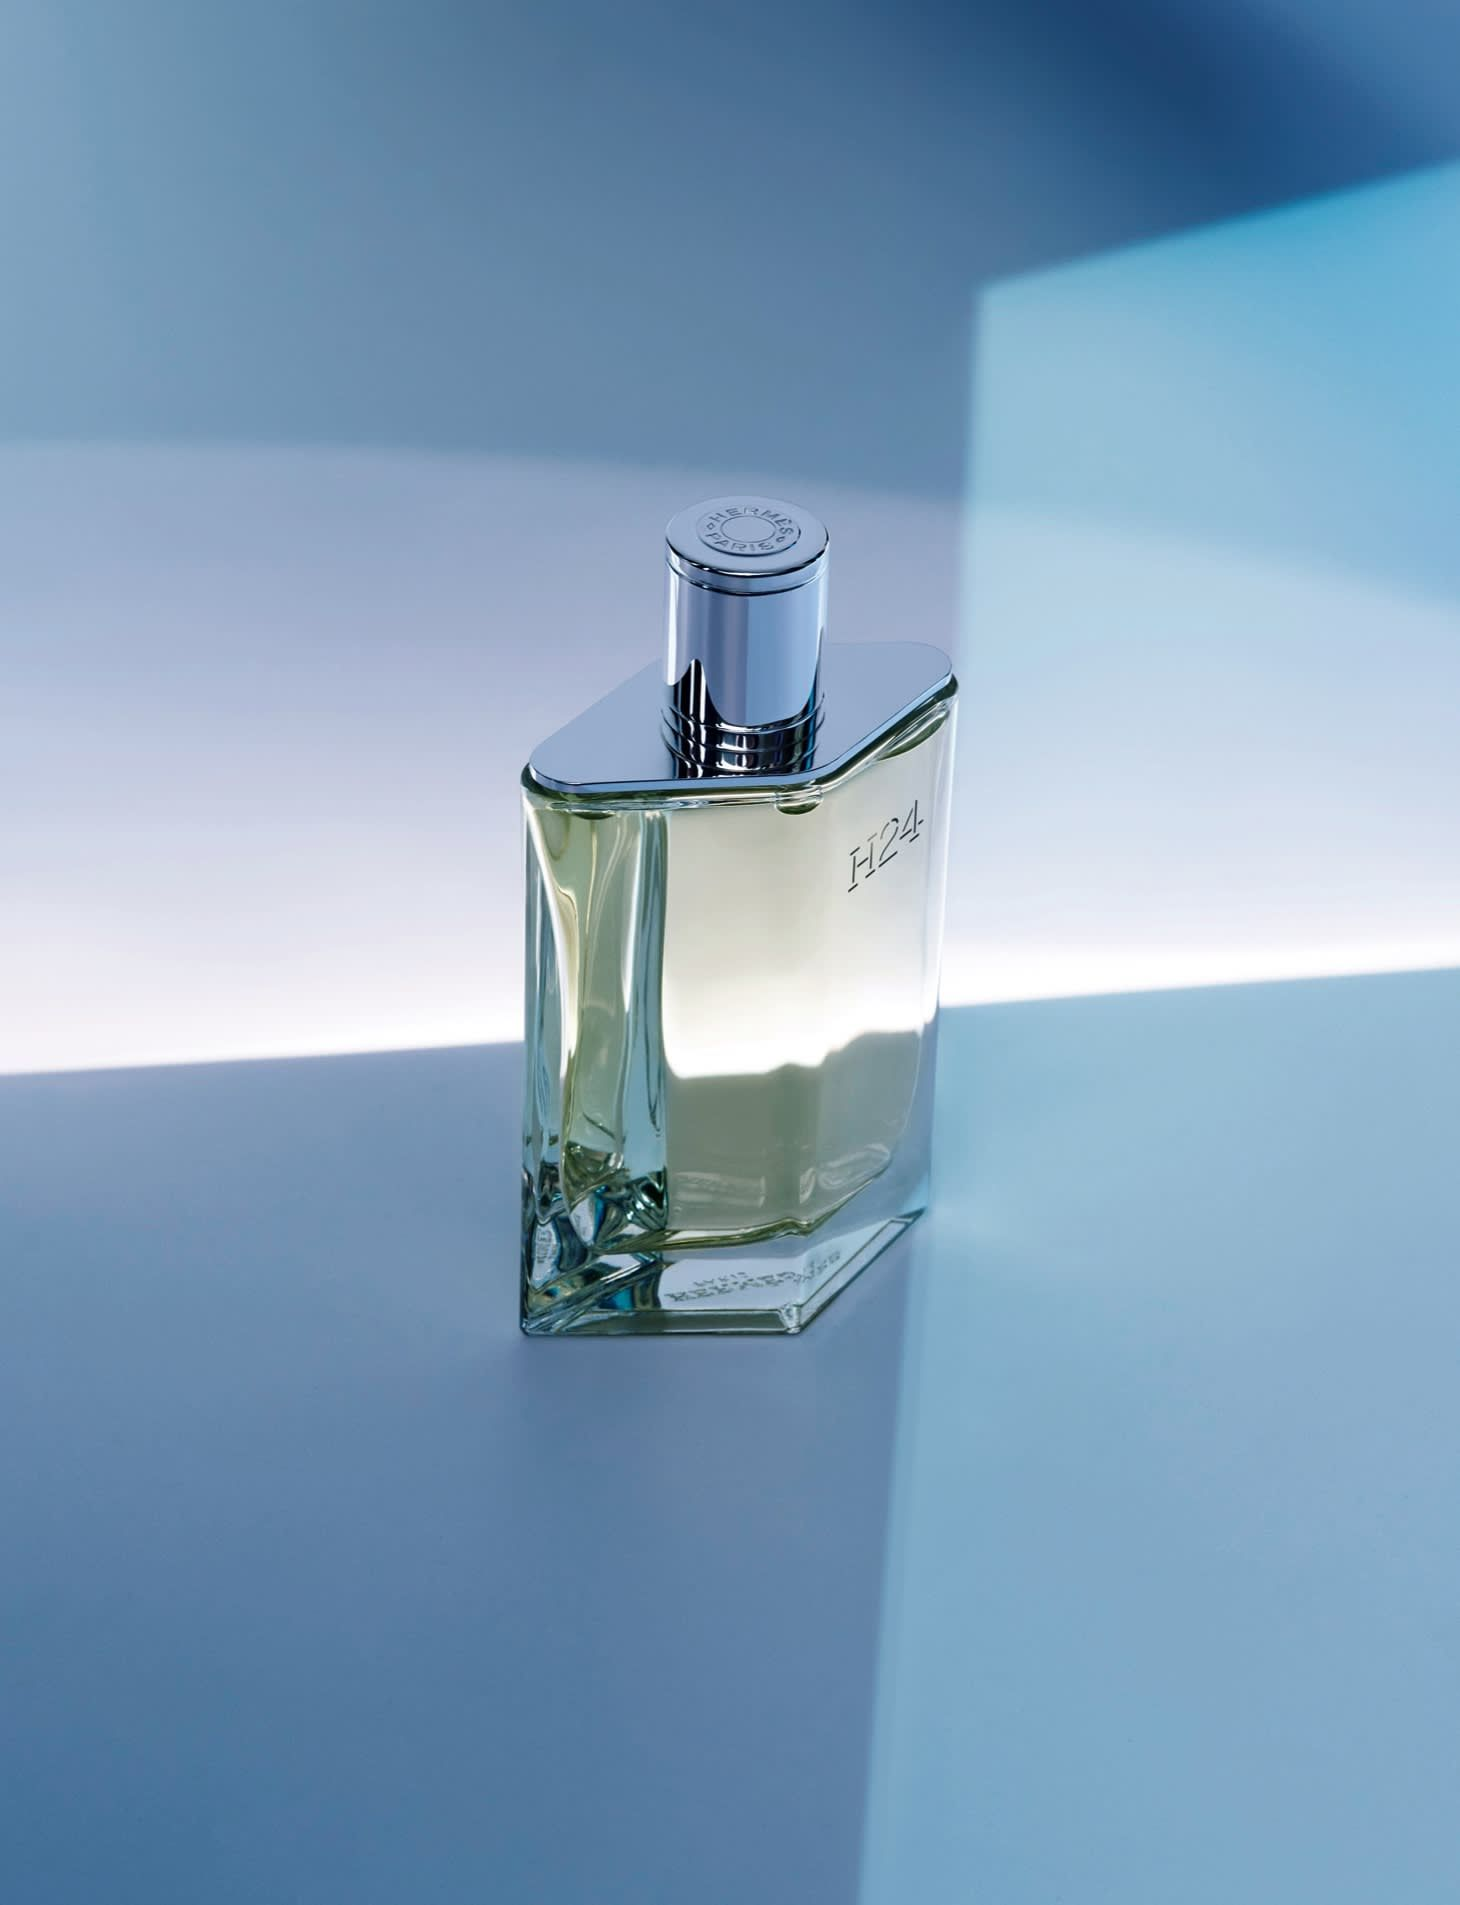 H24: Hermès' New Fragrance For Men Bottles Nature & Tech